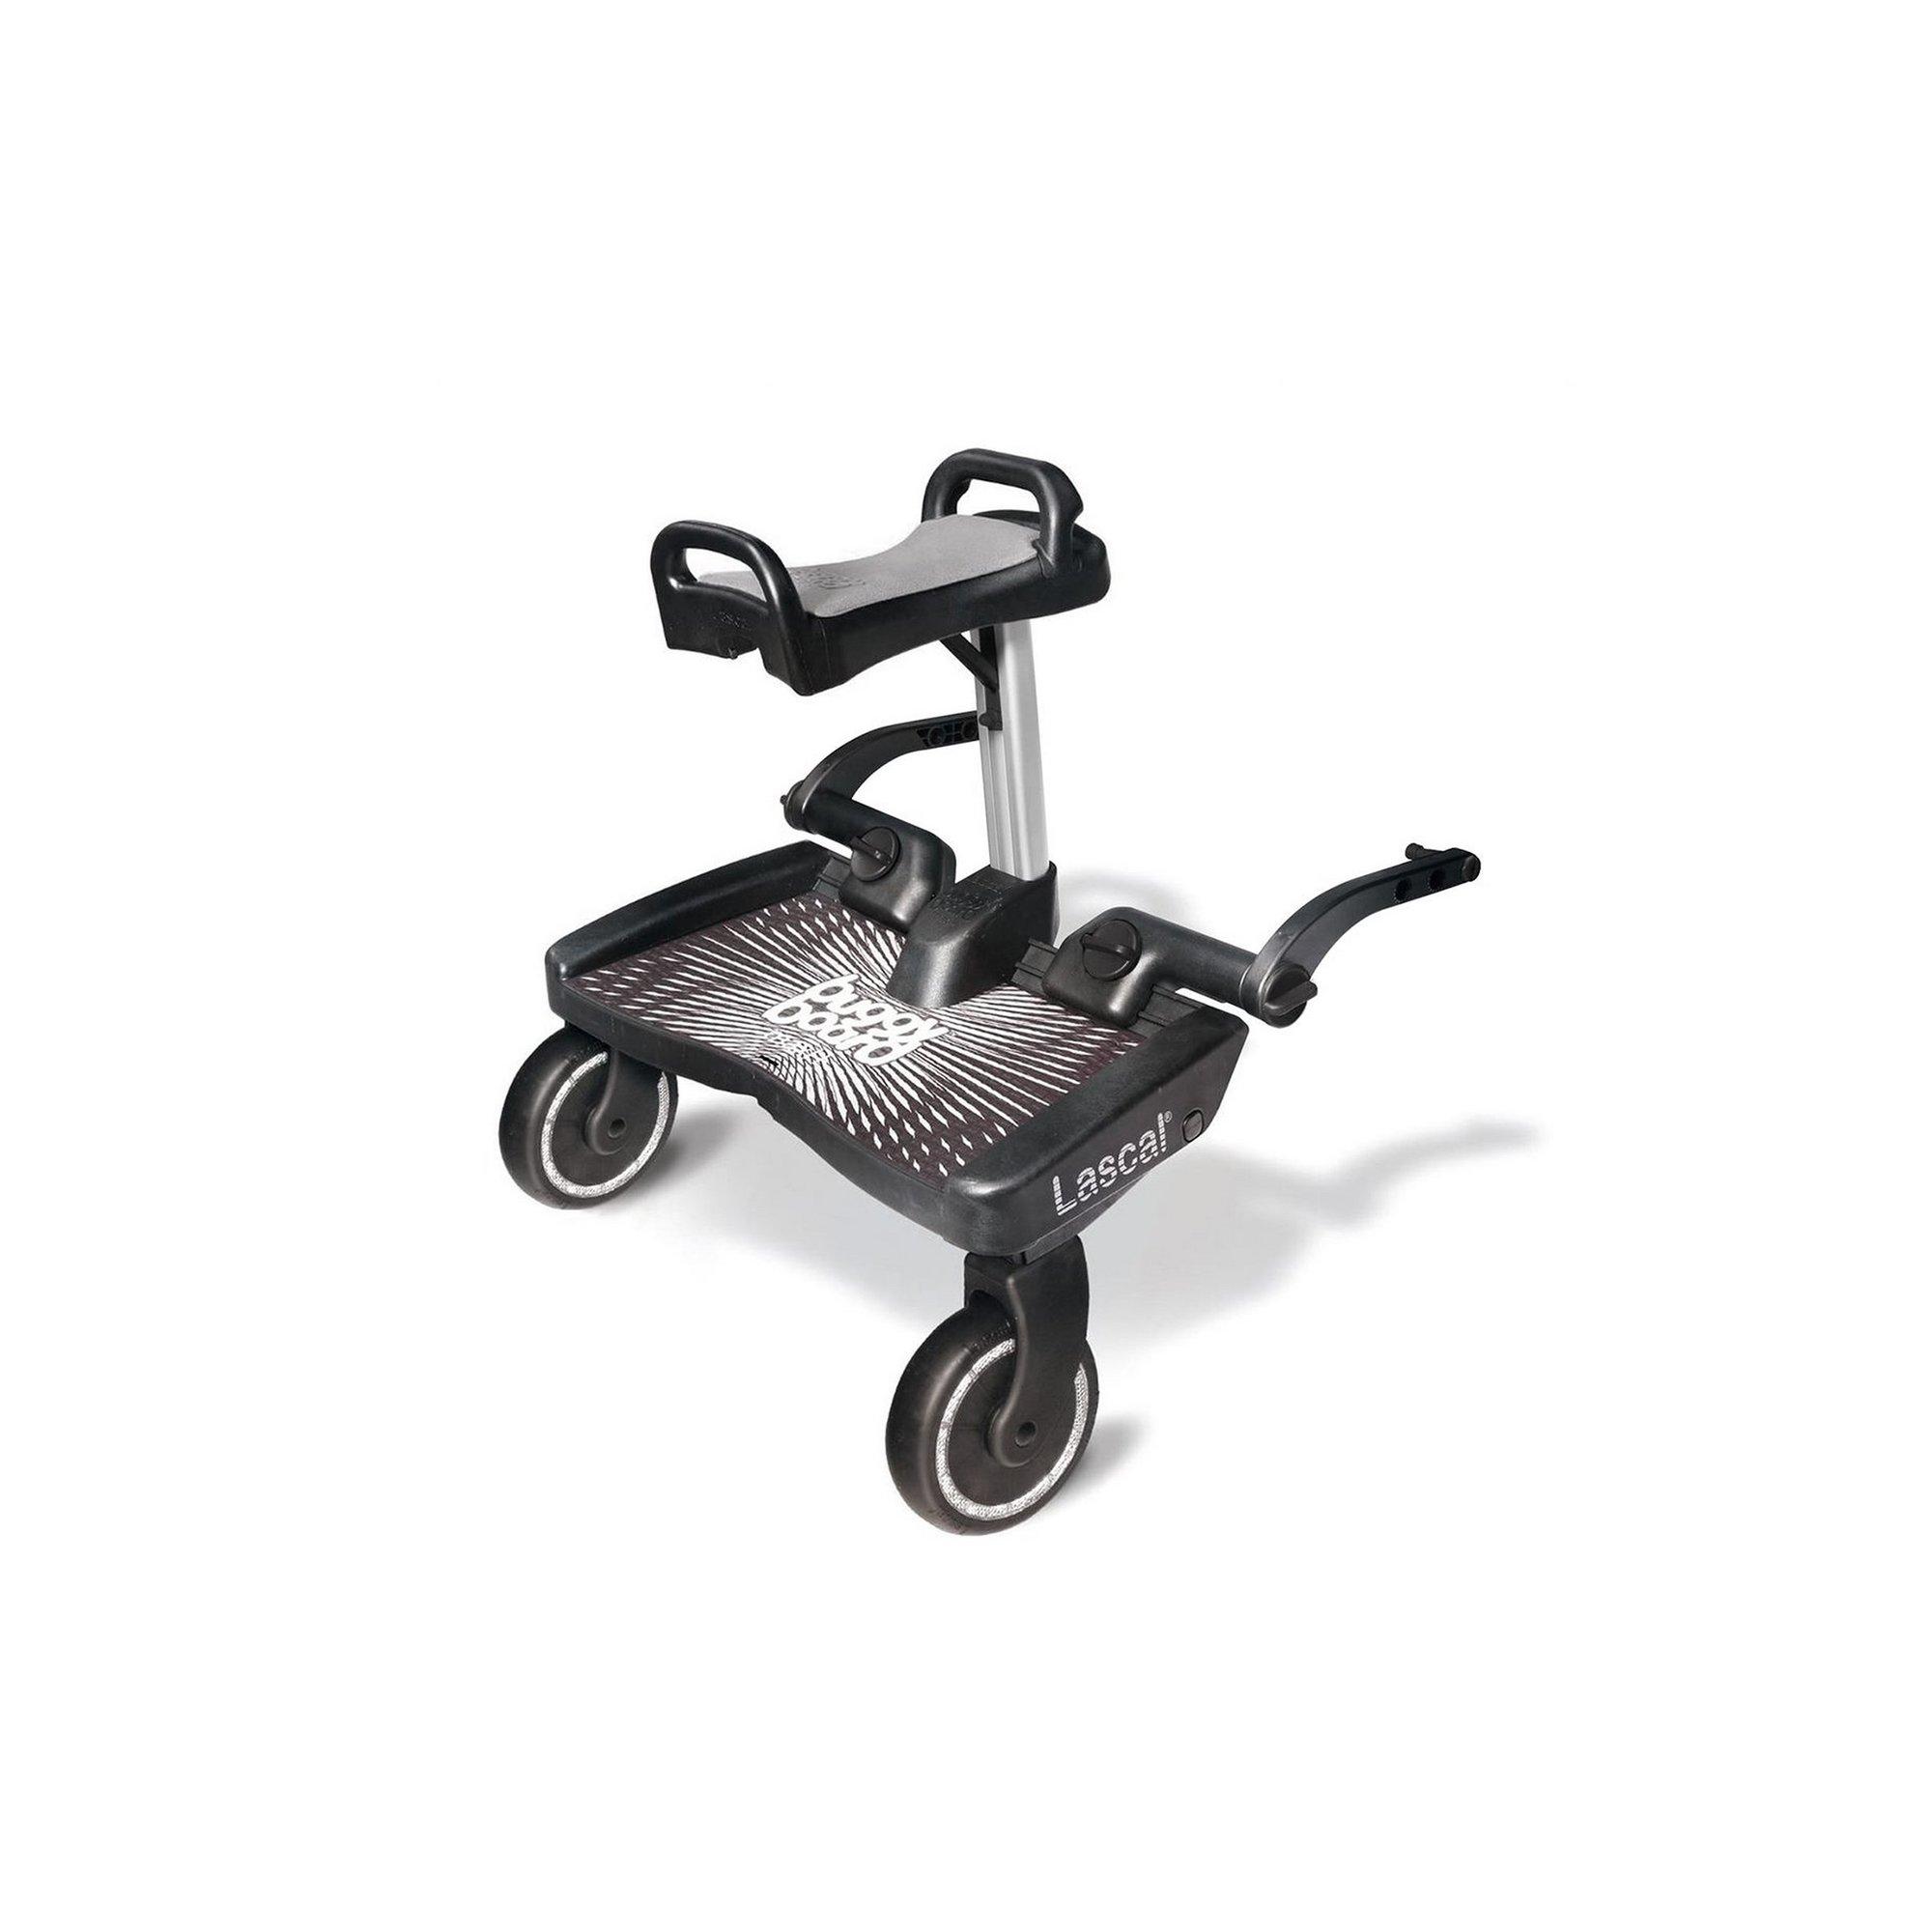 Image of Maxi Plus BuggyBoard Black BuggyBoard with Grey Saddle